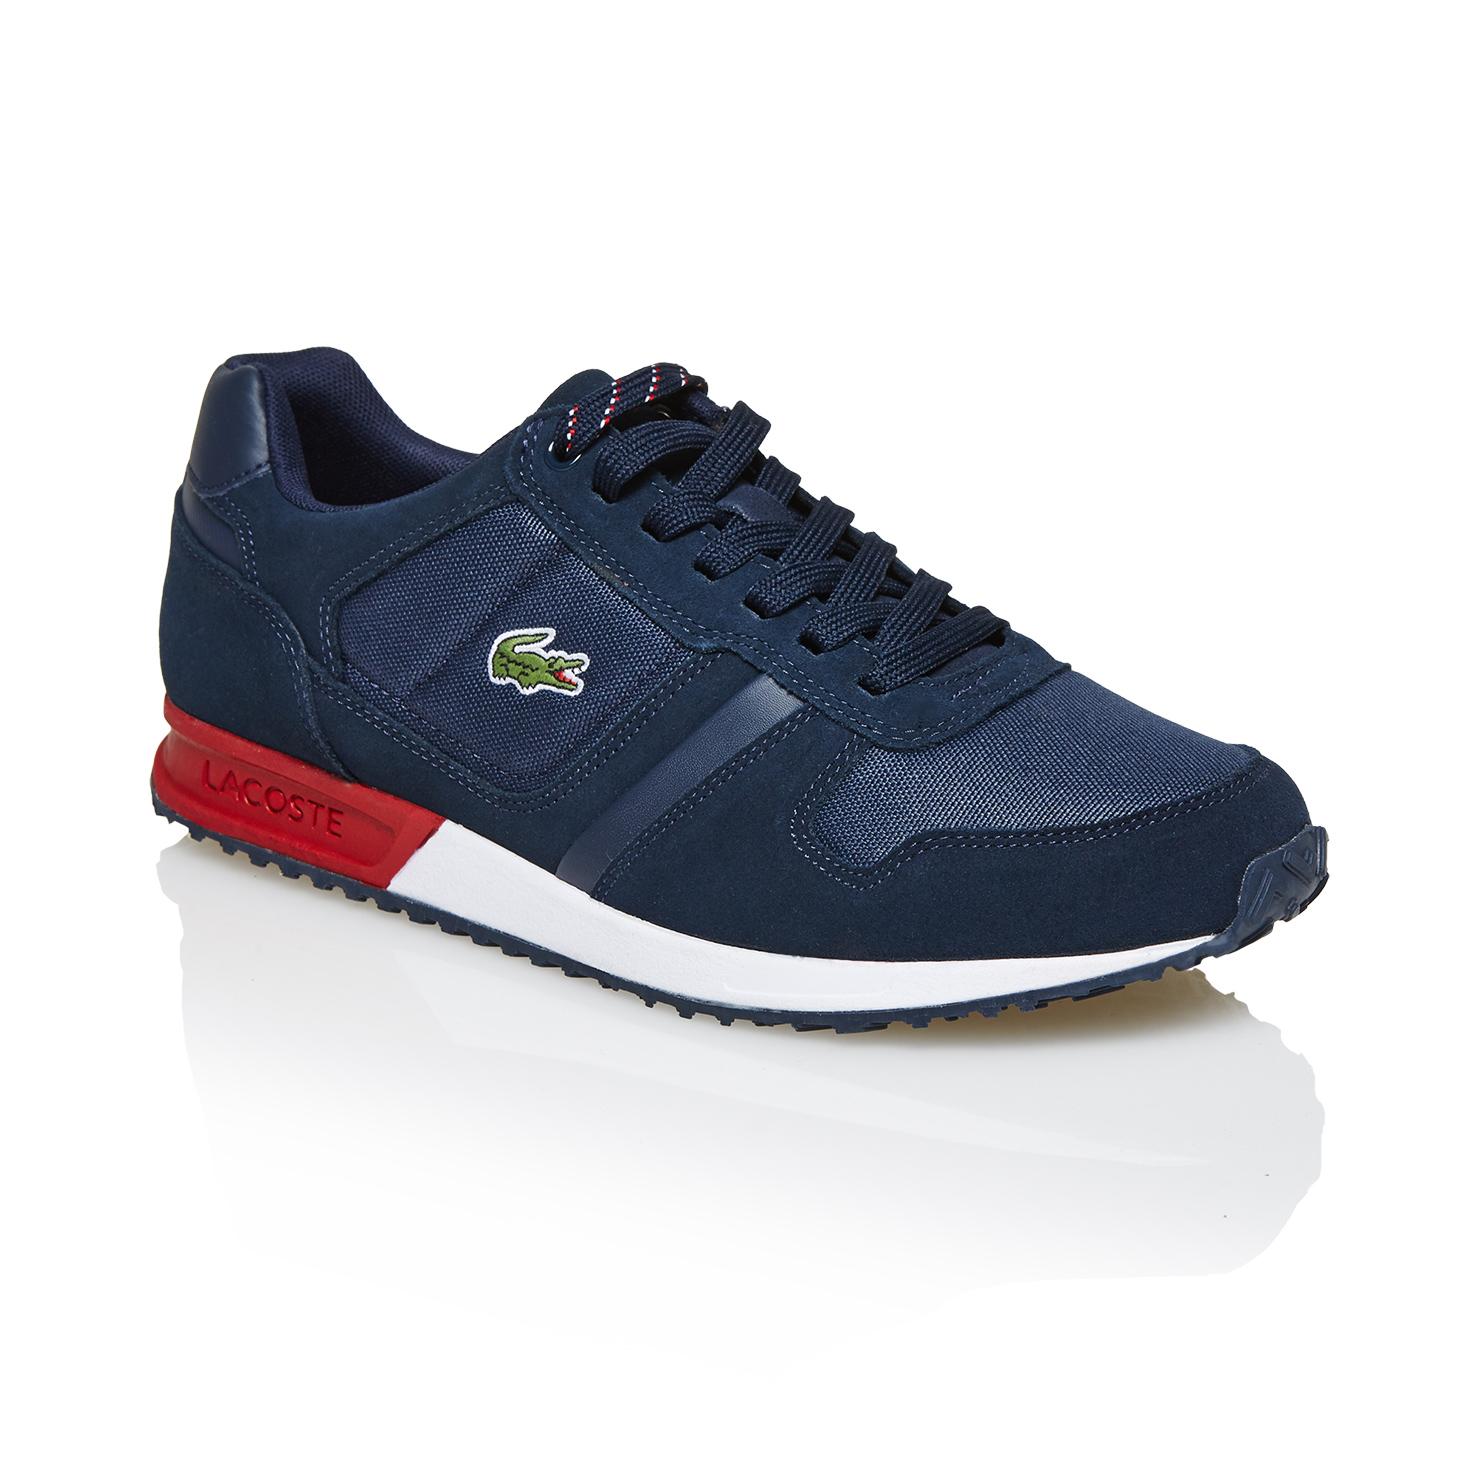 6ee8b7d1e1 Lacoste Vauban Pag Erkek Lacivert Sneaker Erkek Spor Ayakkabı ...